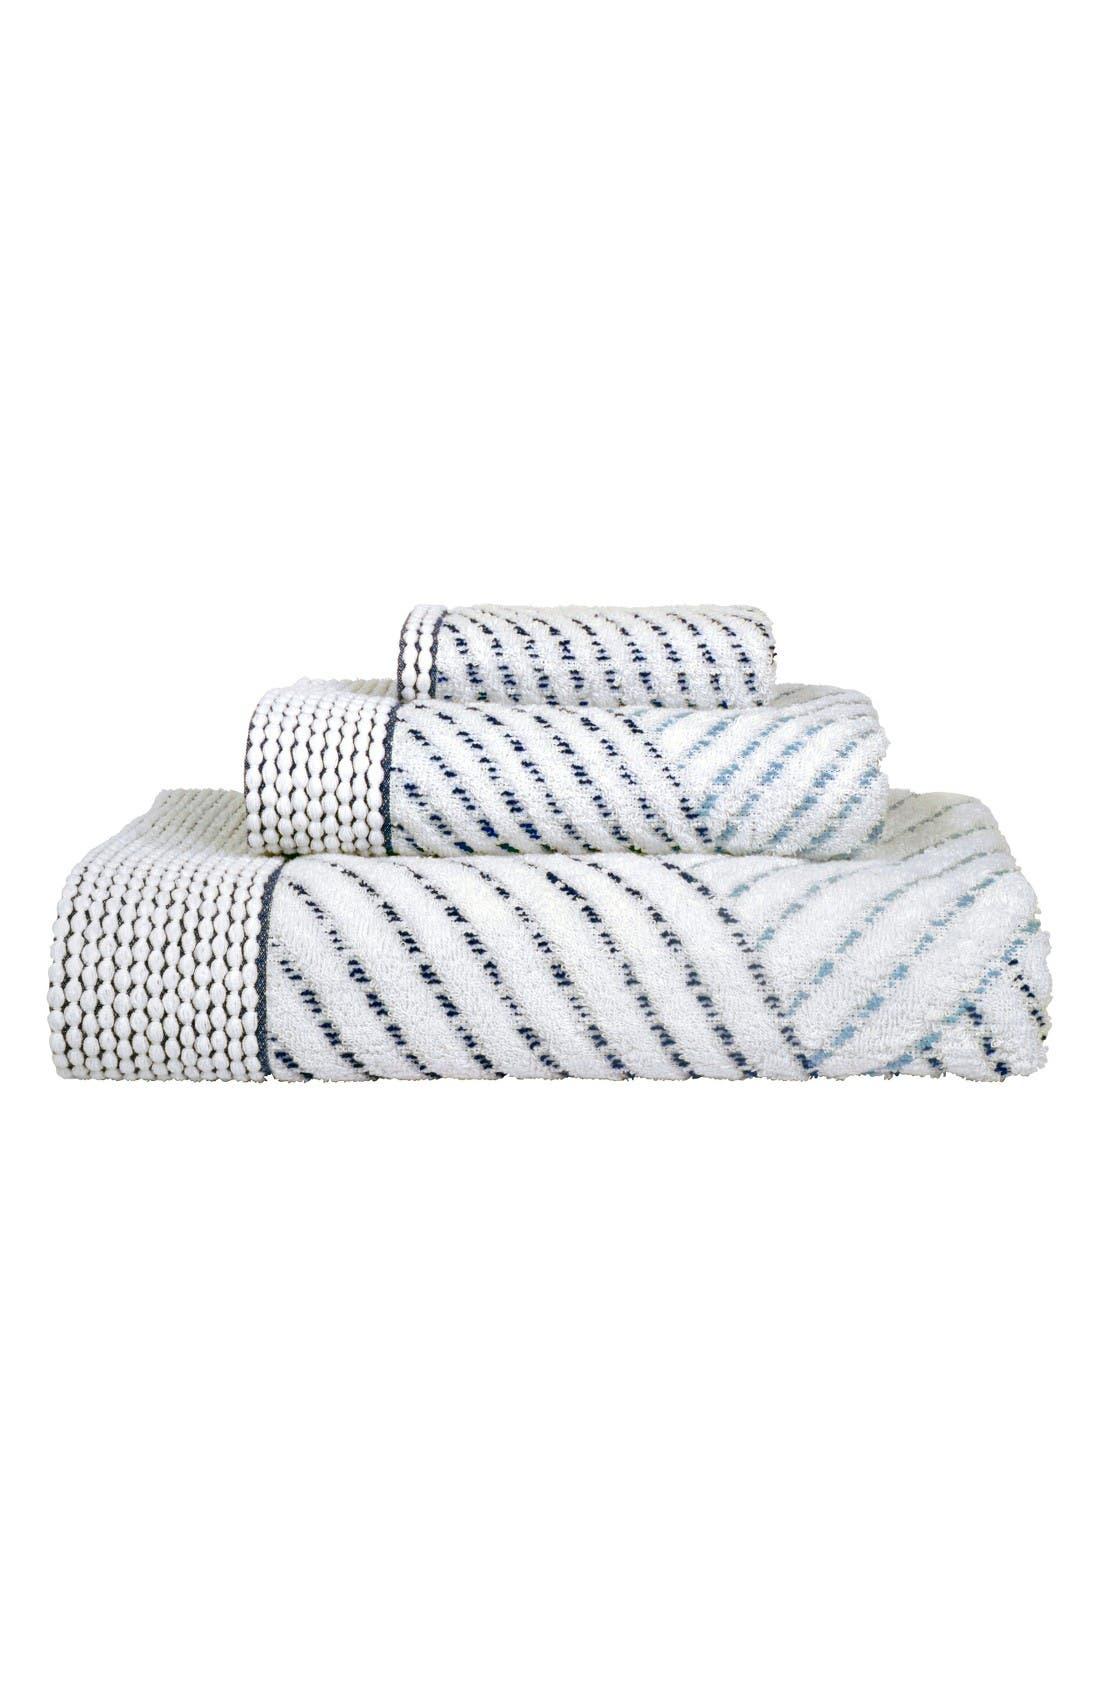 Sazid Hand Towel,                             Alternate thumbnail 2, color,                             Indigo/ Slate